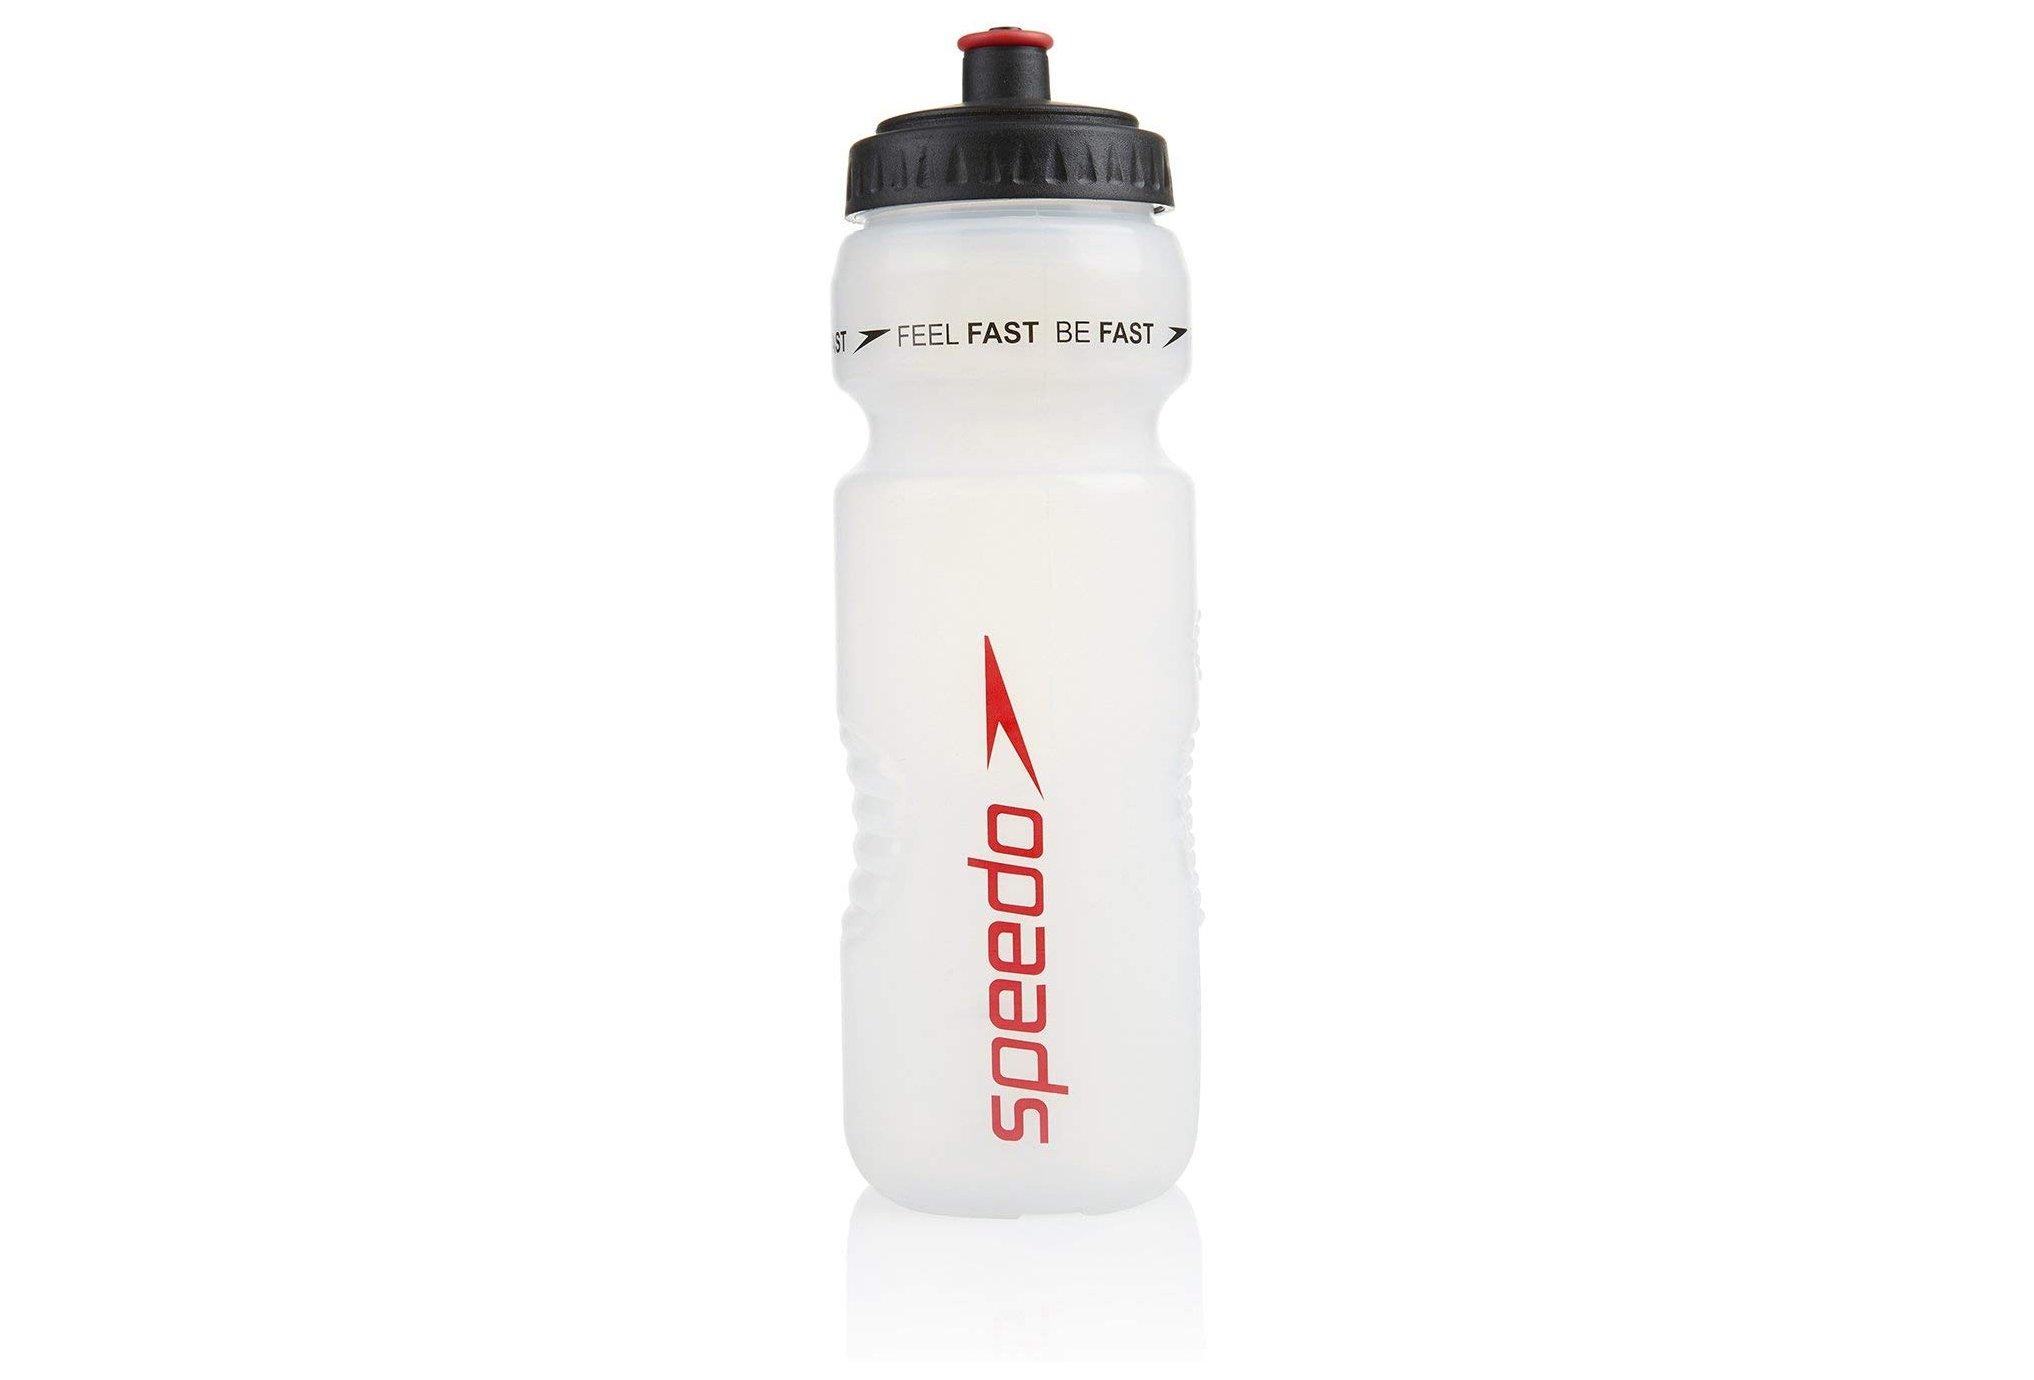 Speedo Bidon 800 ml Sac hydratation / Gourde